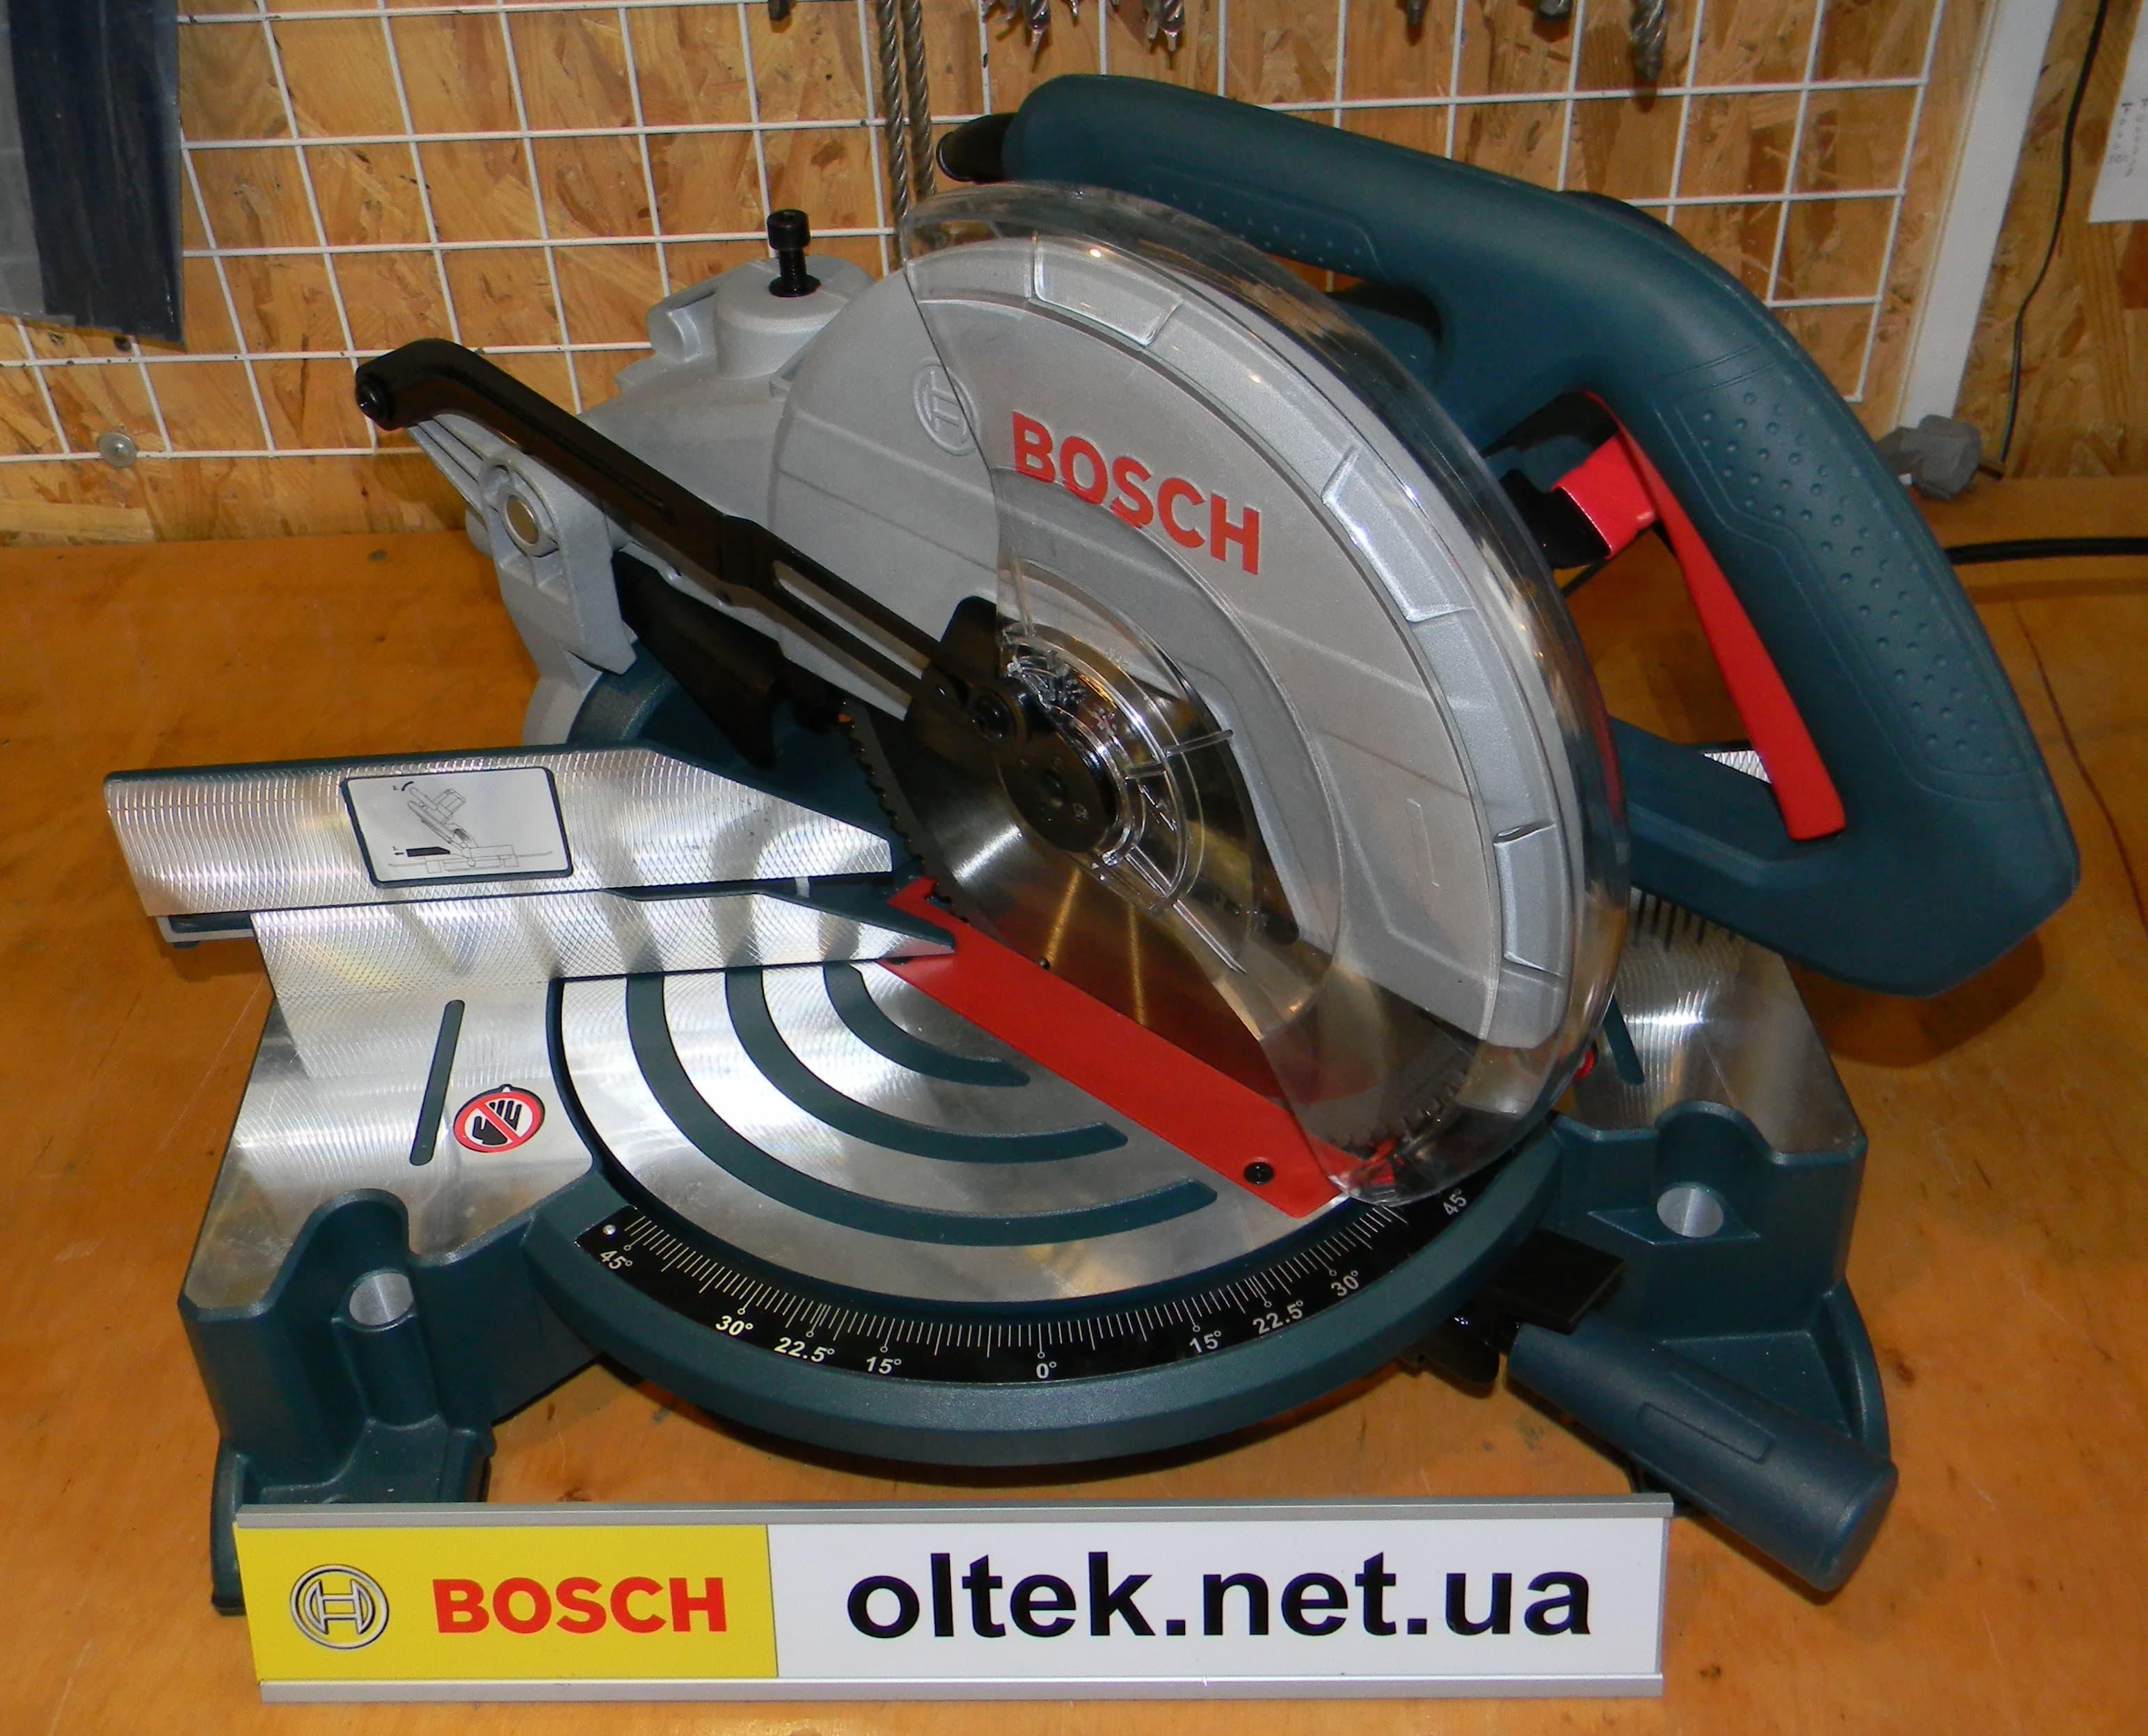 Bosch GCM 10 MX (1)